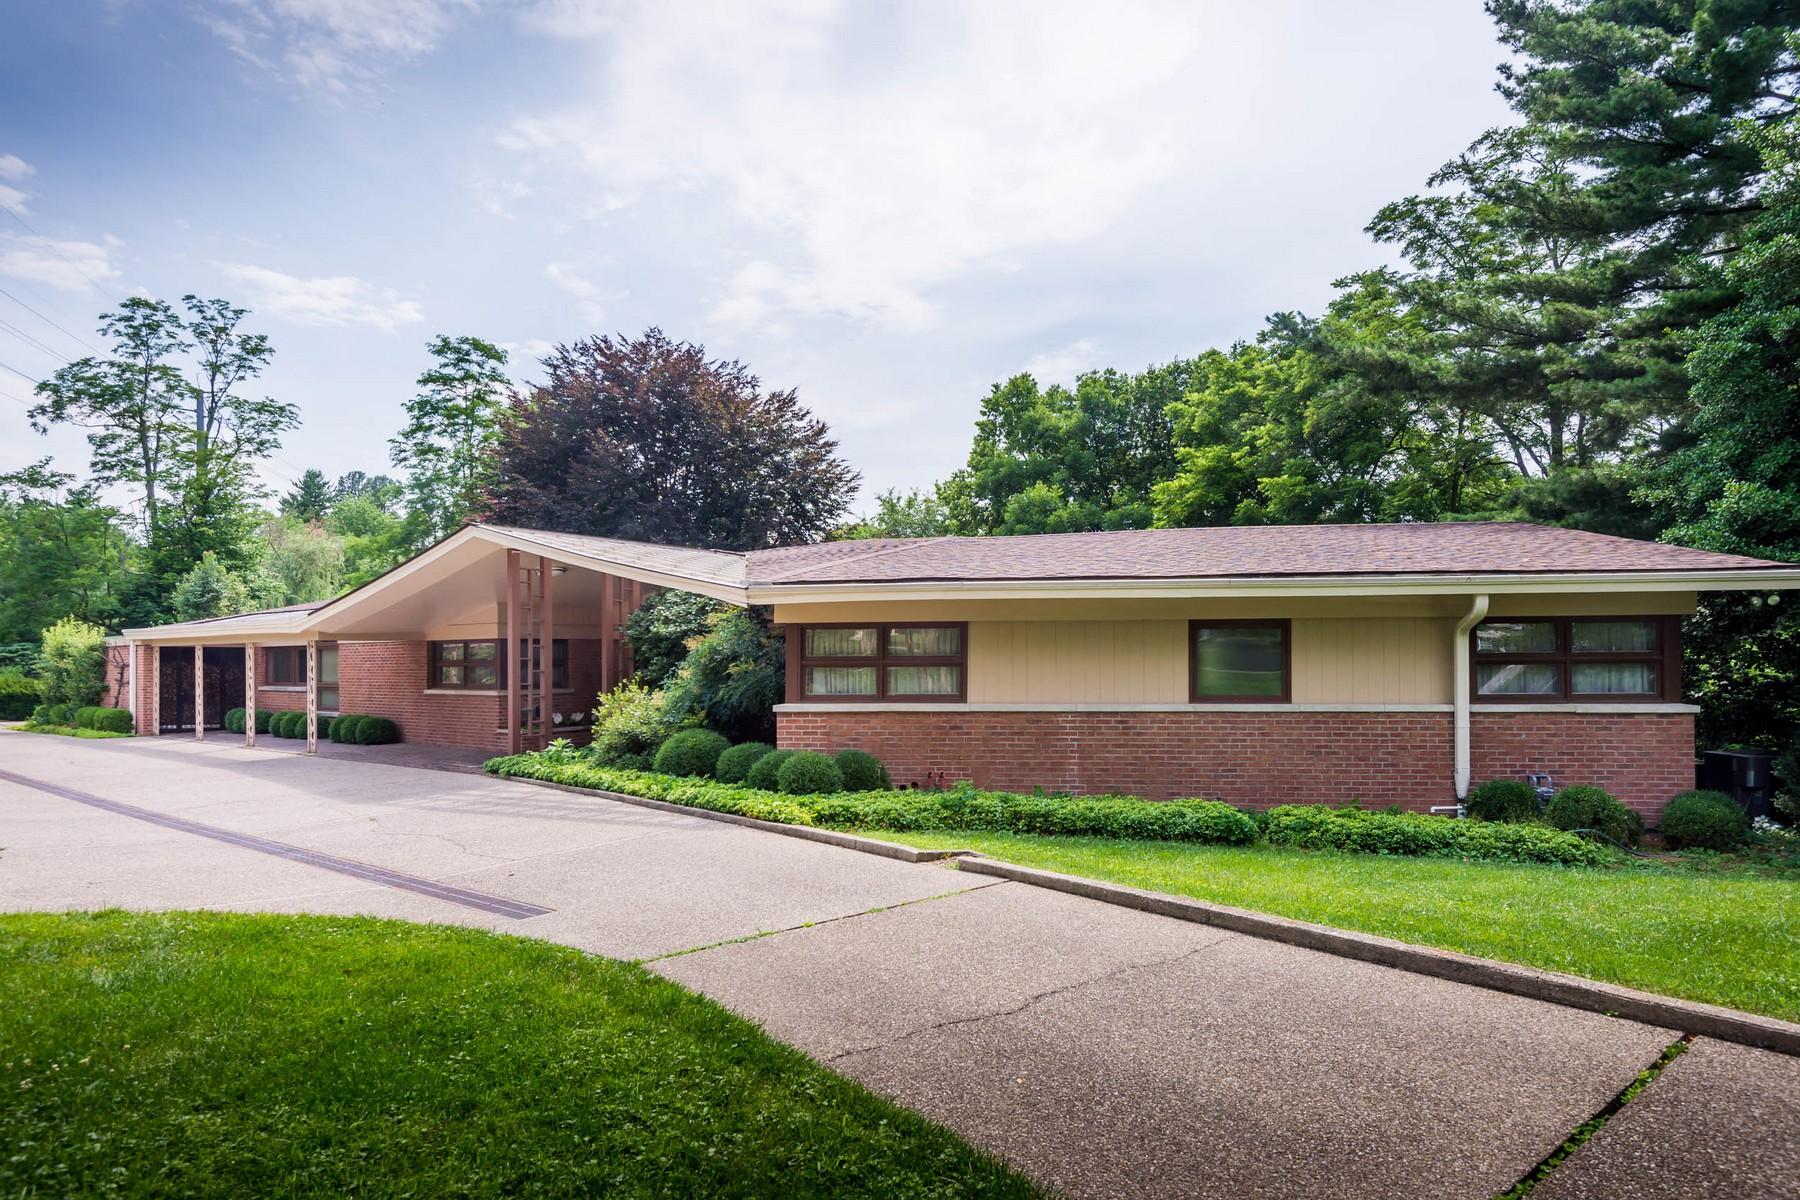 Single Family Home for Sale at 1776 Lakewood Lane Lexington, Kentucky, 40502 United States